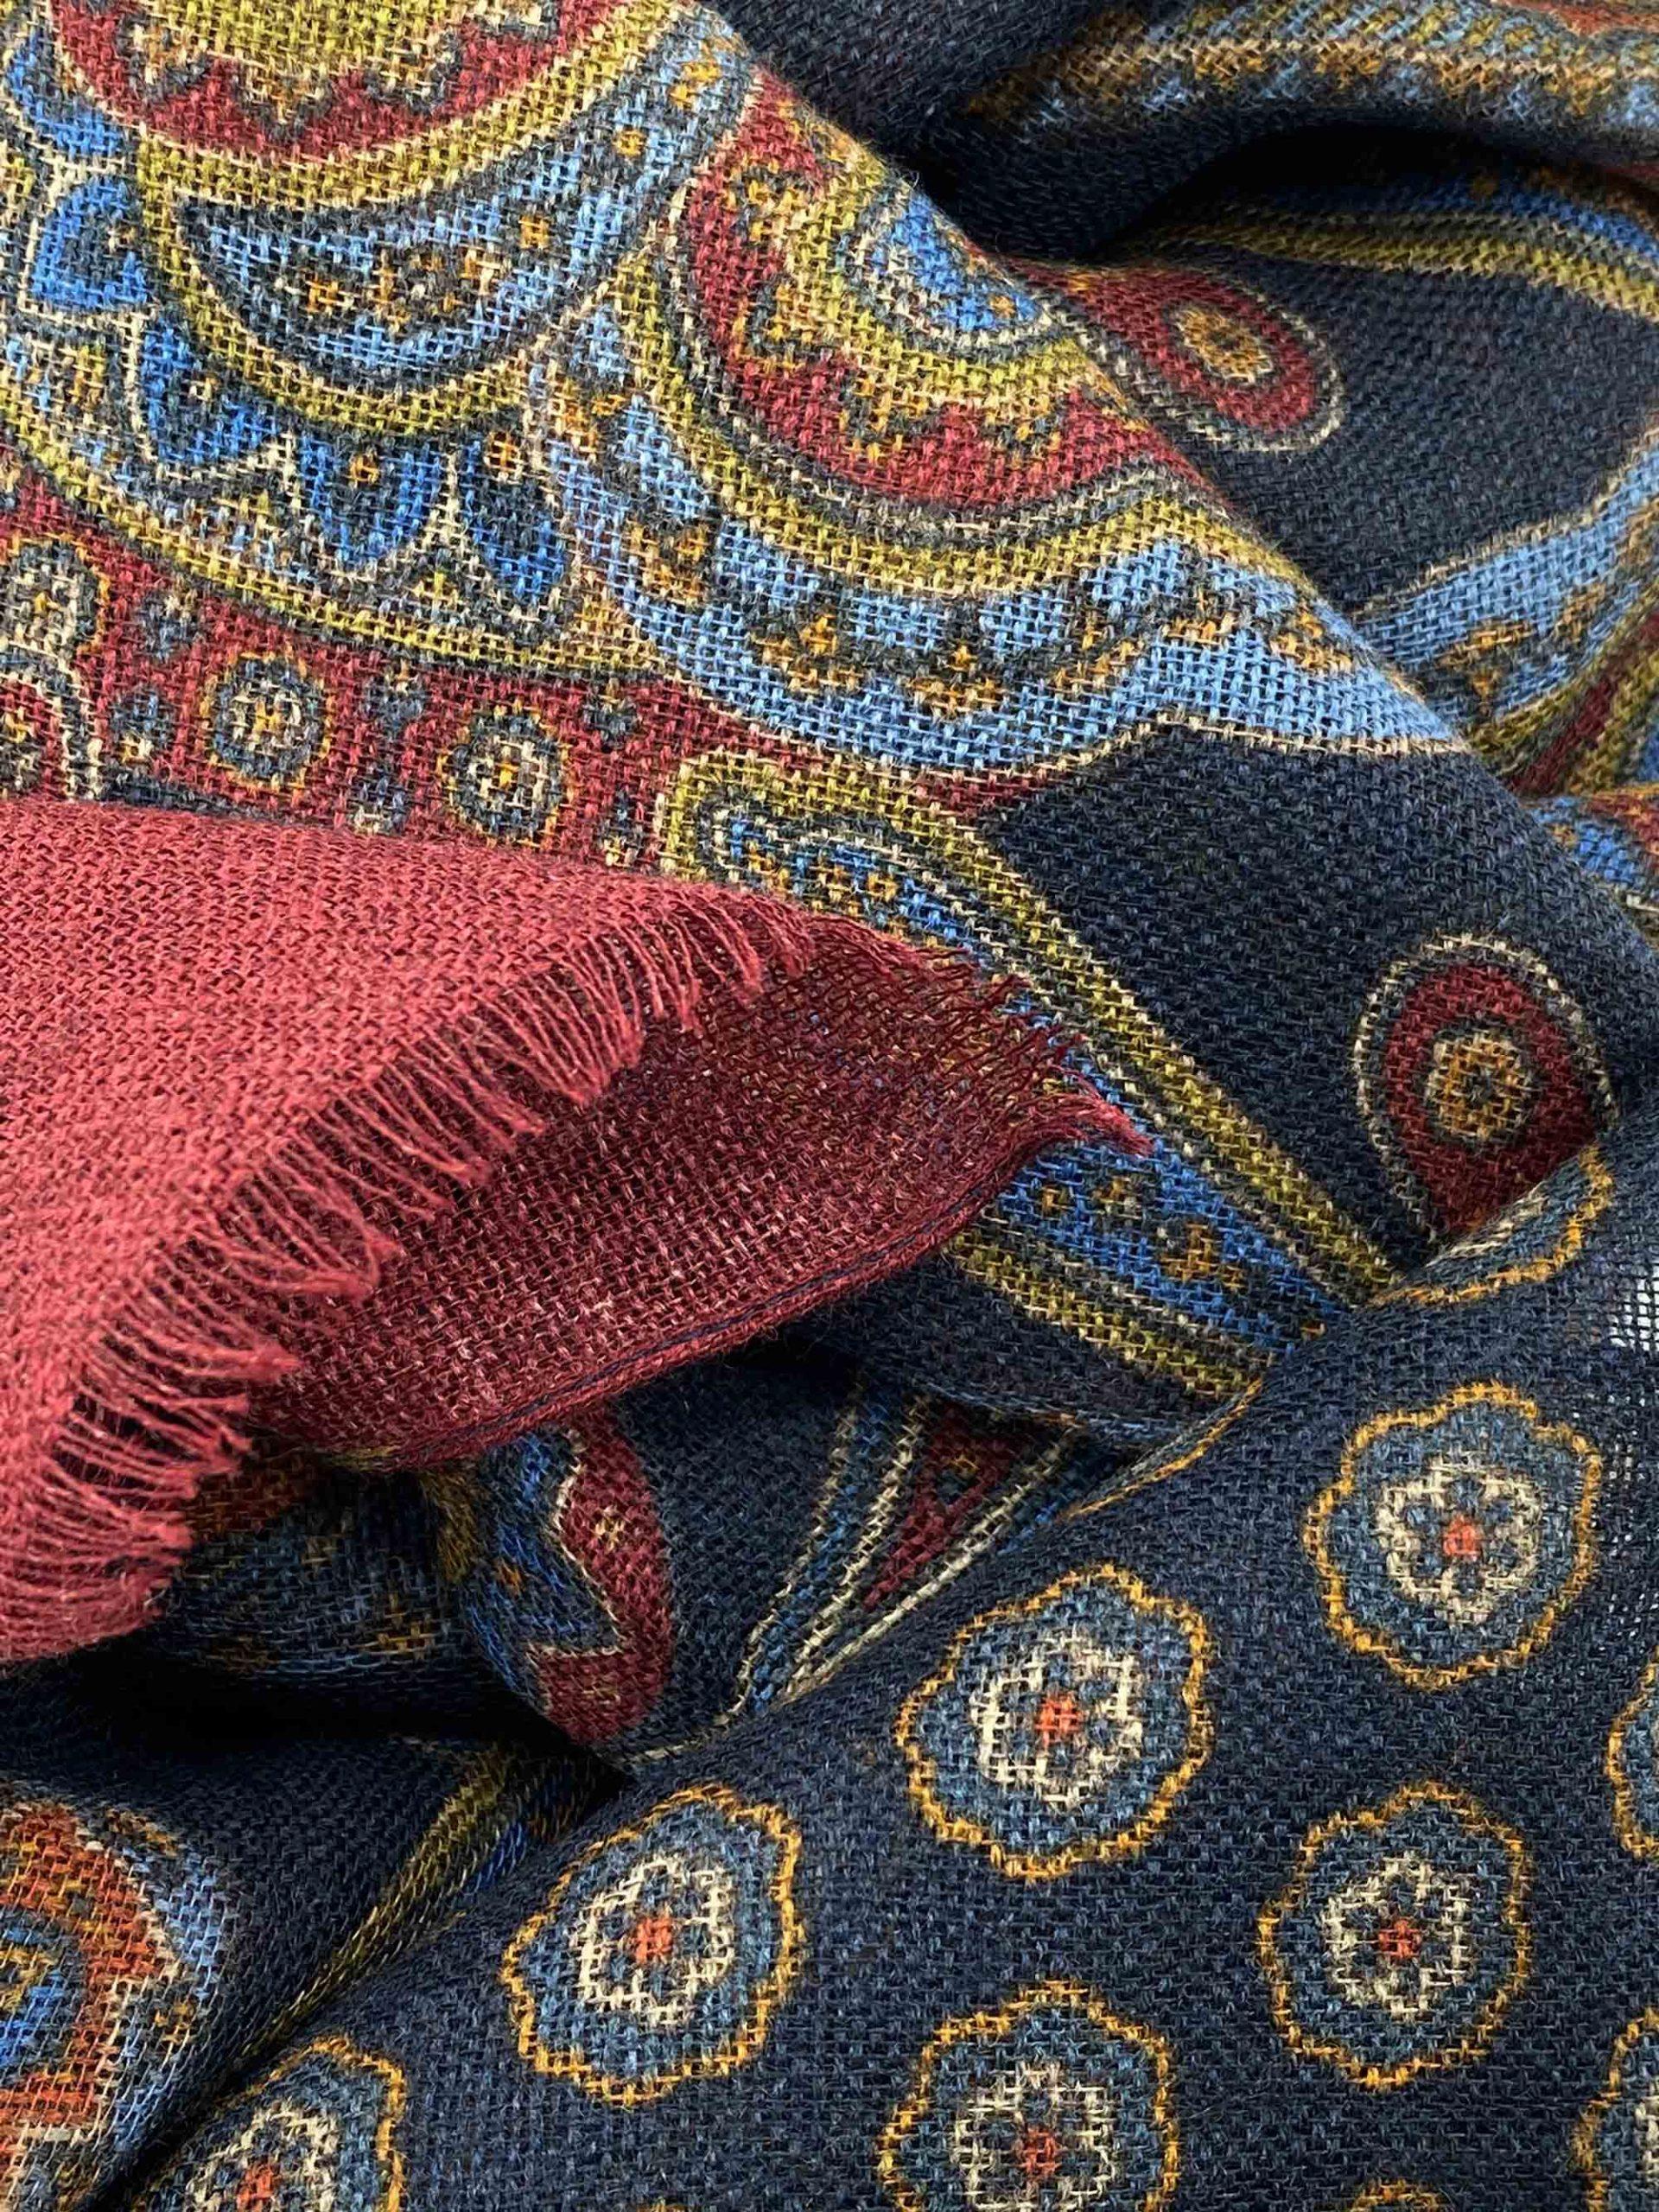 pashmina buona fortuna exclusivas comprar online moda italiana foulards shop burdeos azul